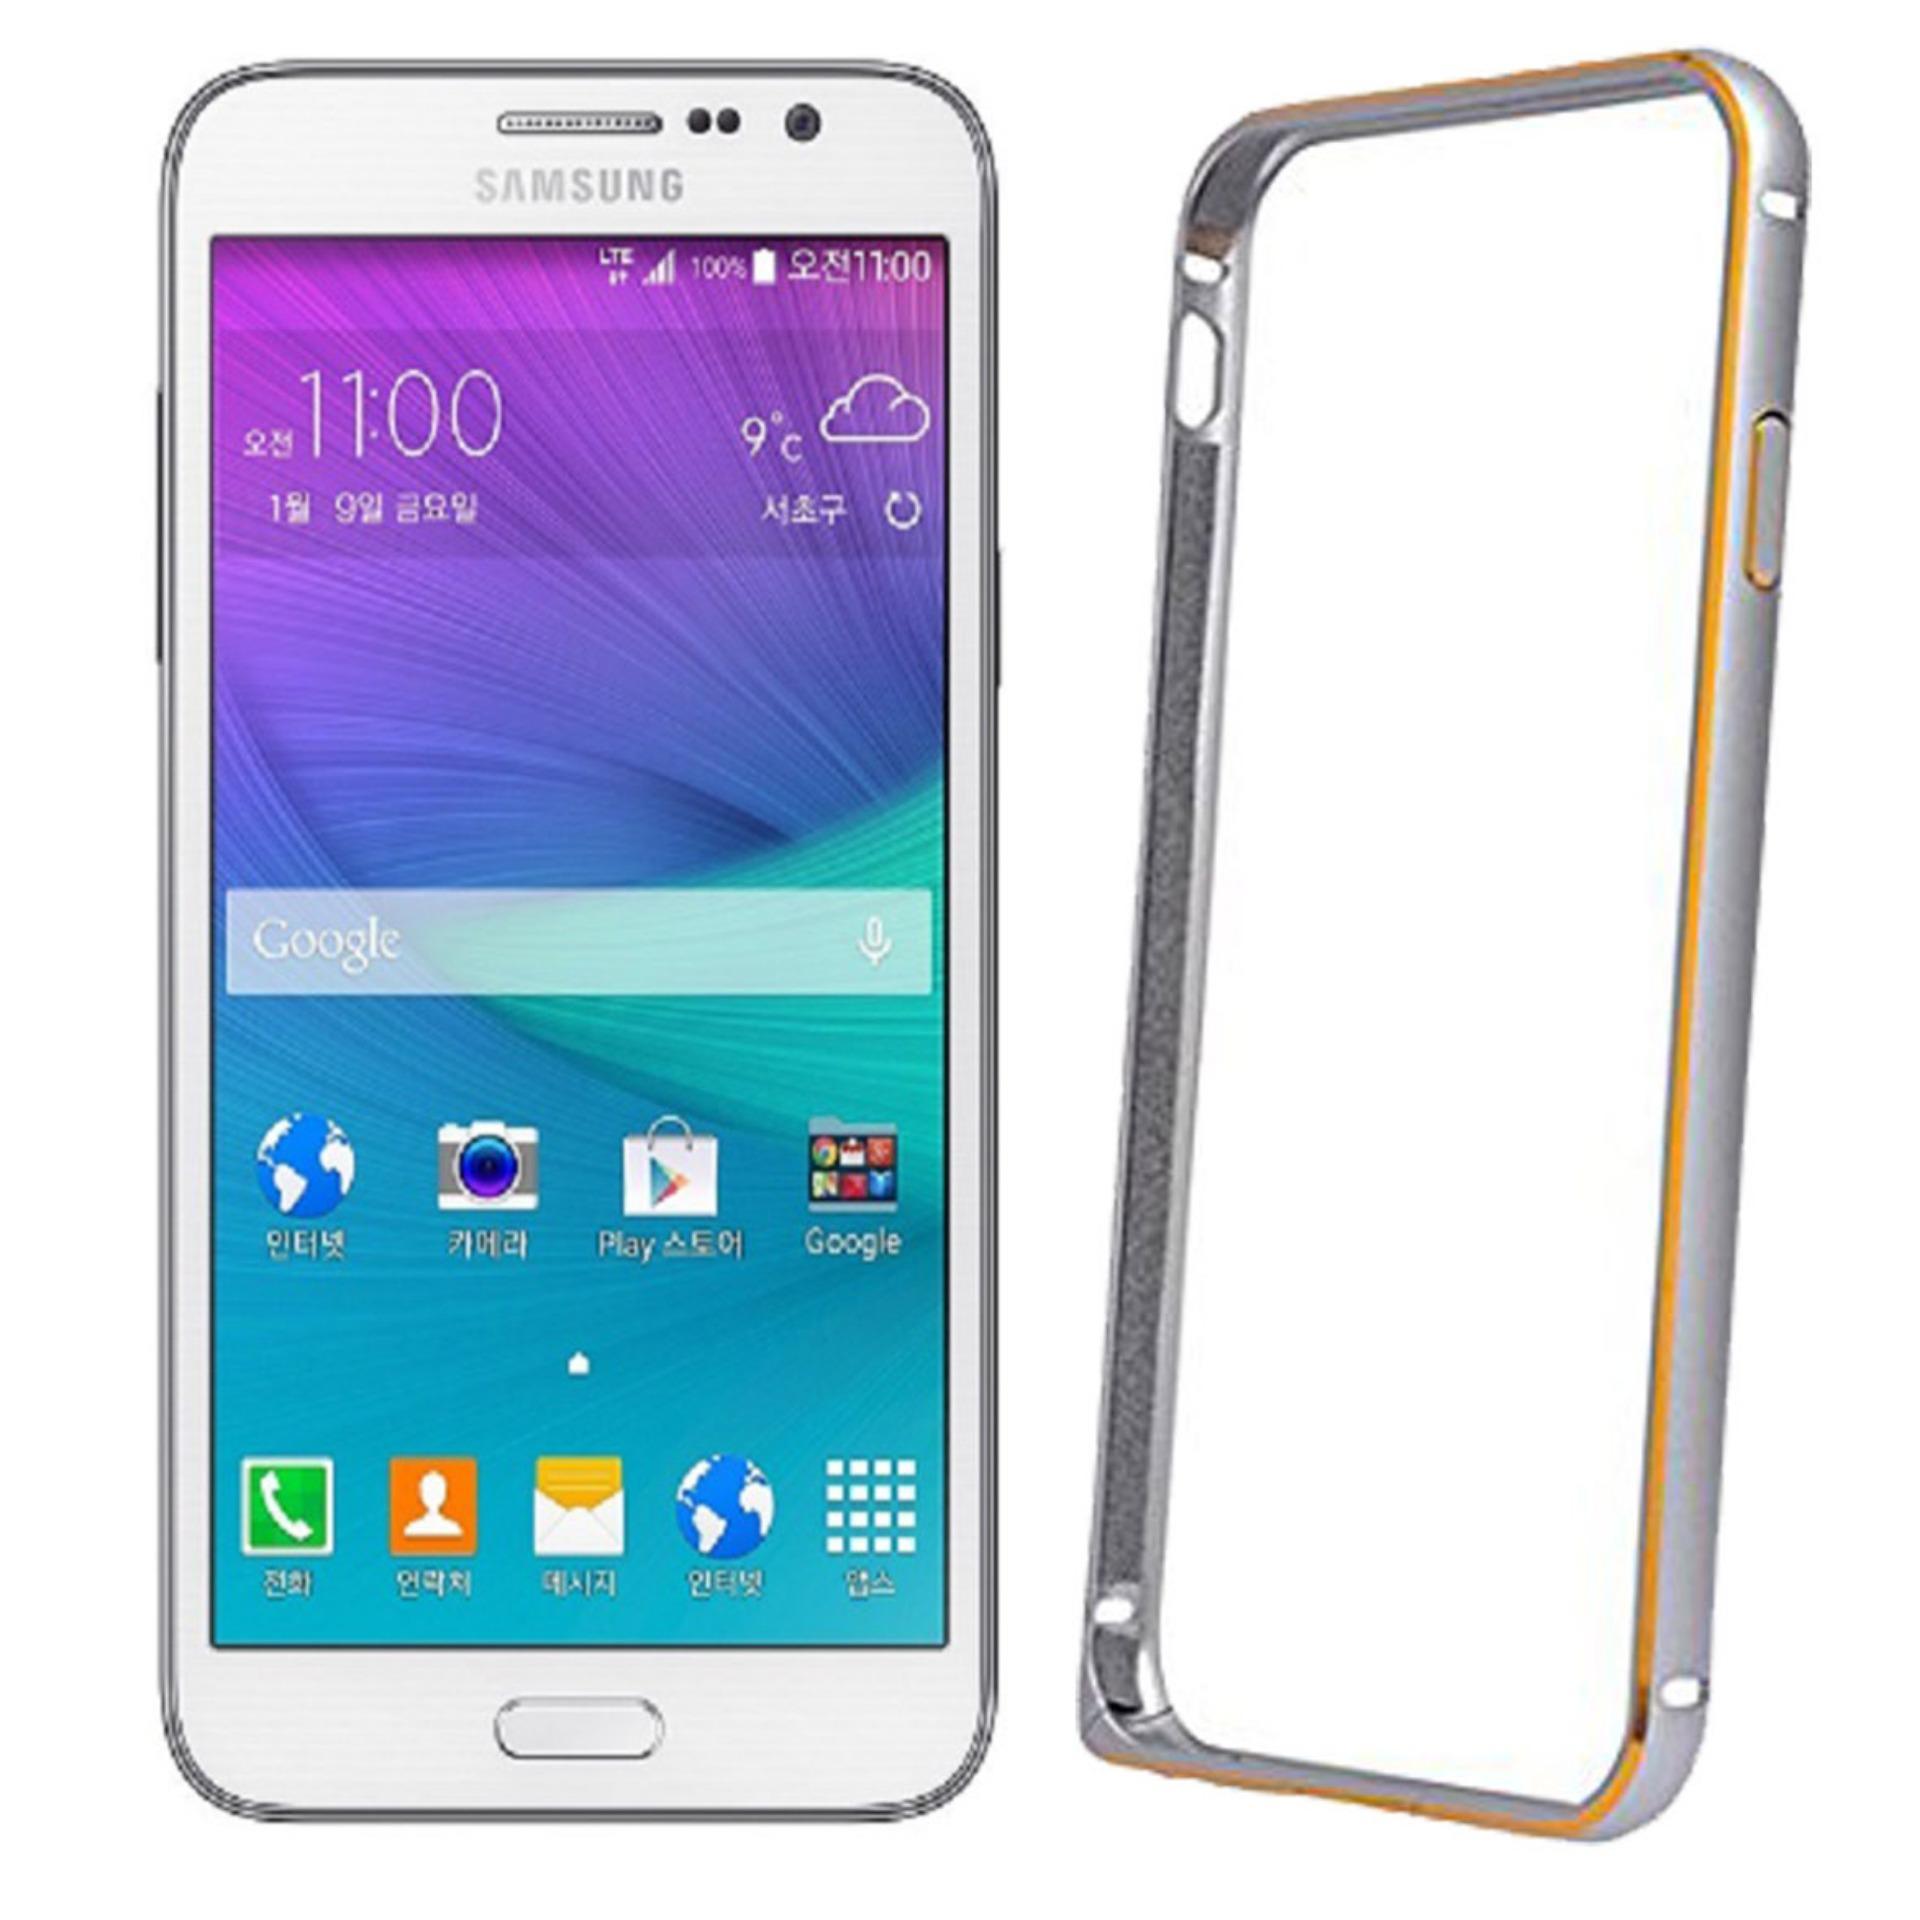 Aluminium Bumper Stainless Metal Bezel List for Samsung Galaxy Grand Max / G720 / G7202 / G7202D / LTE Duos - Silver